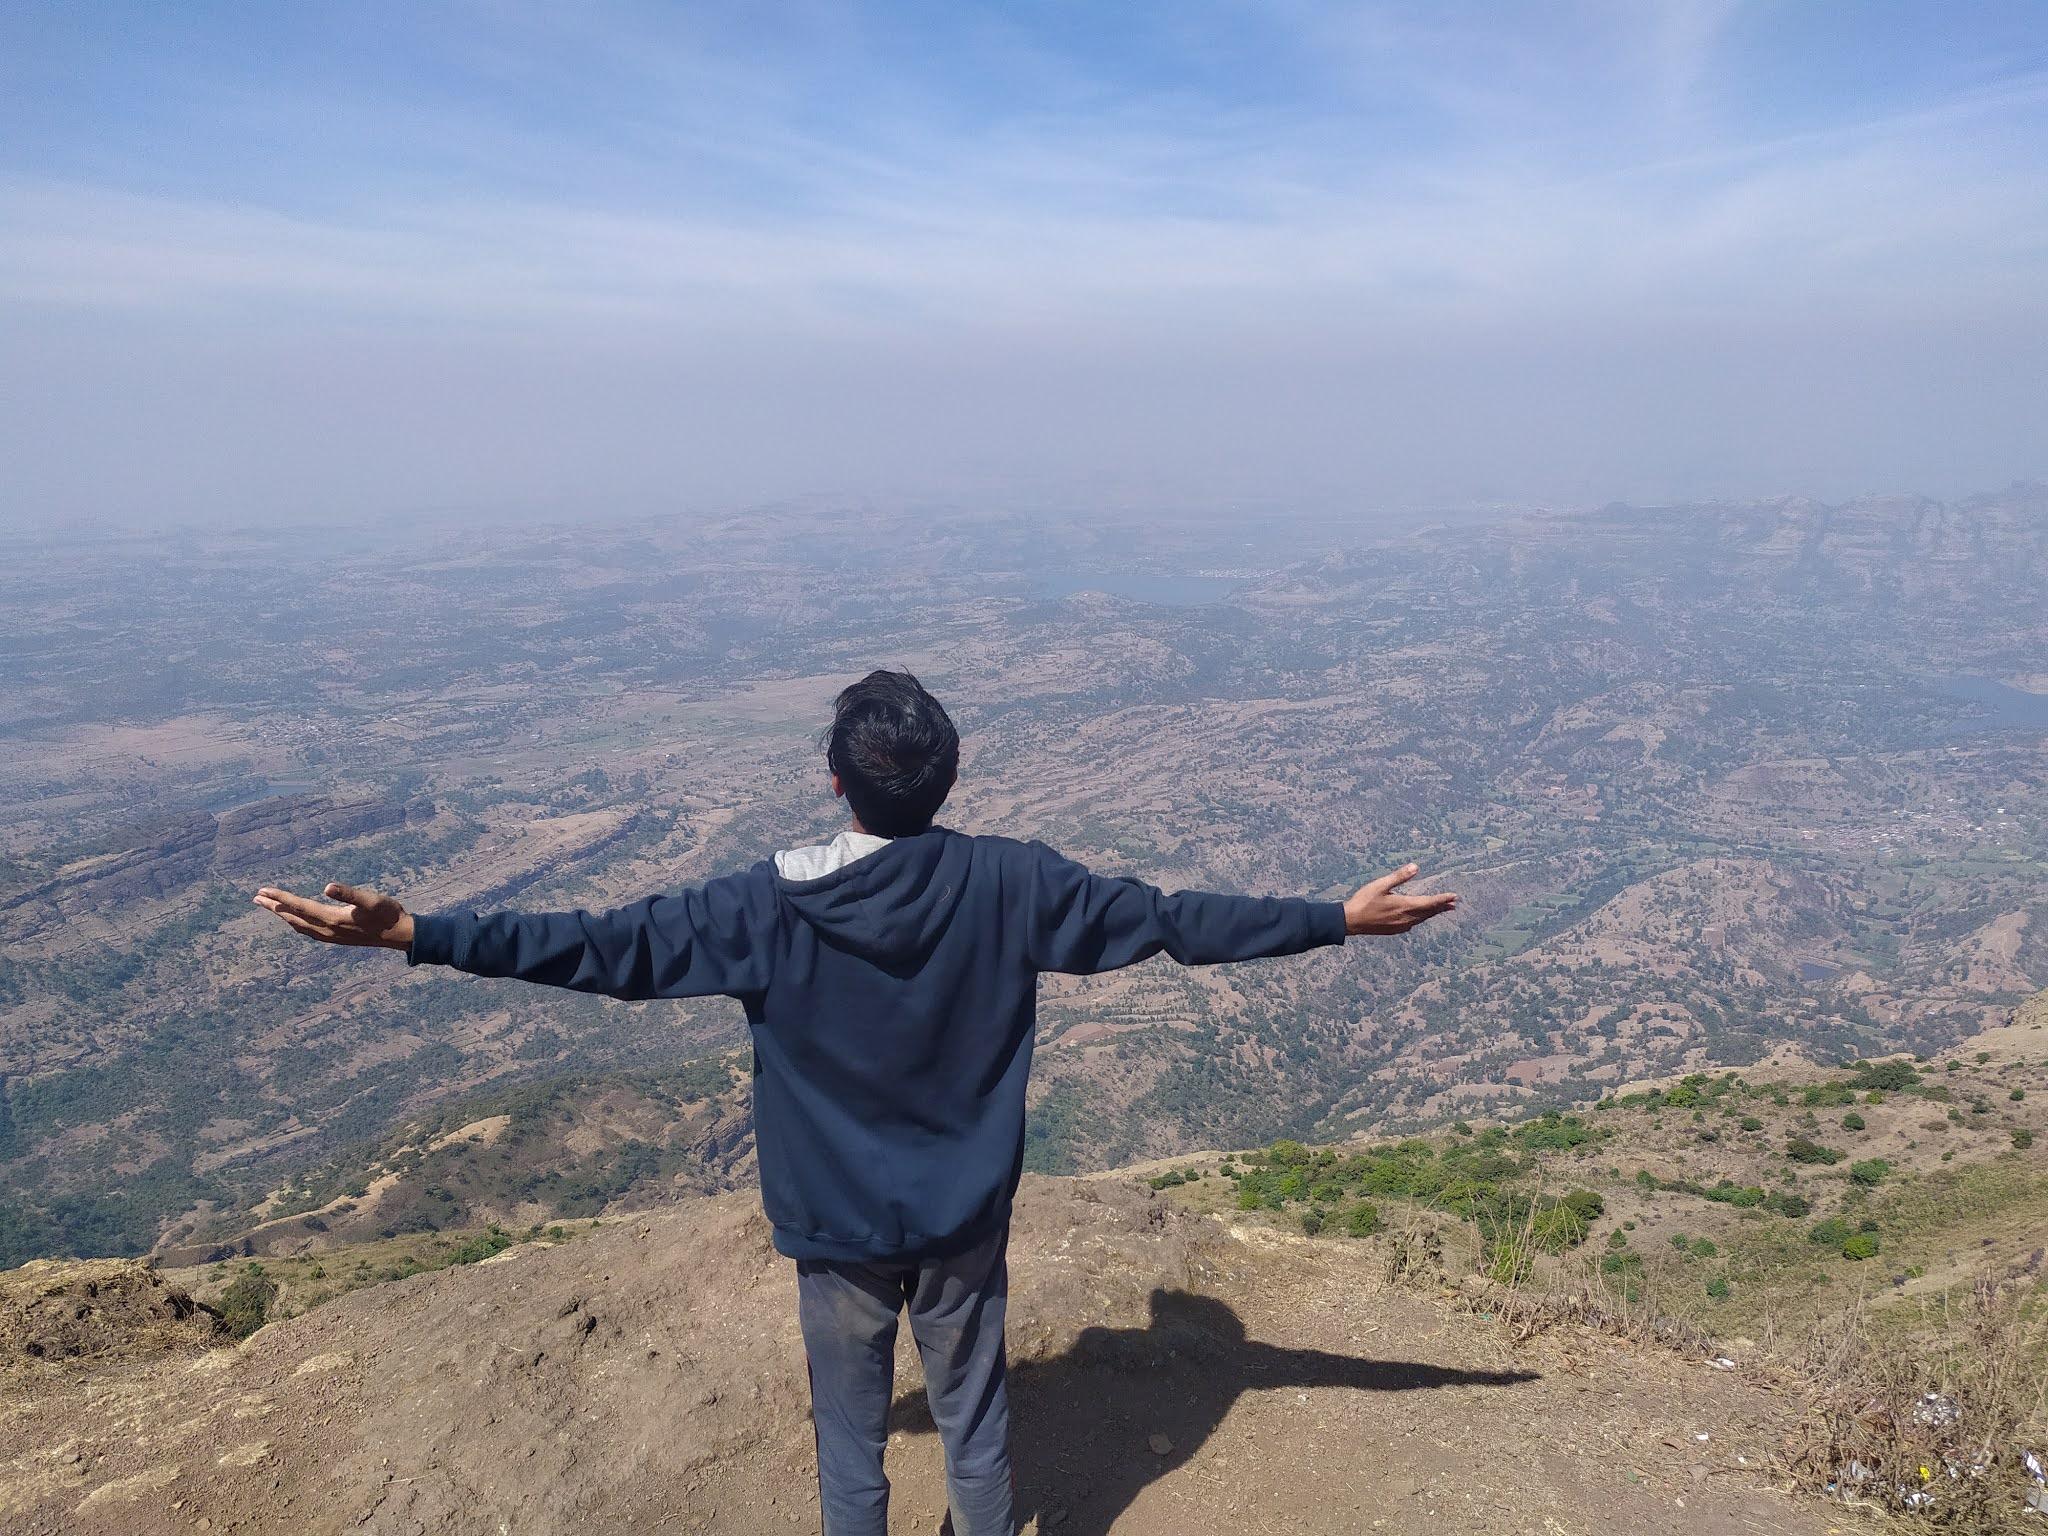 Kalsubai-maharashtra-highest-peak-trekking-diaries